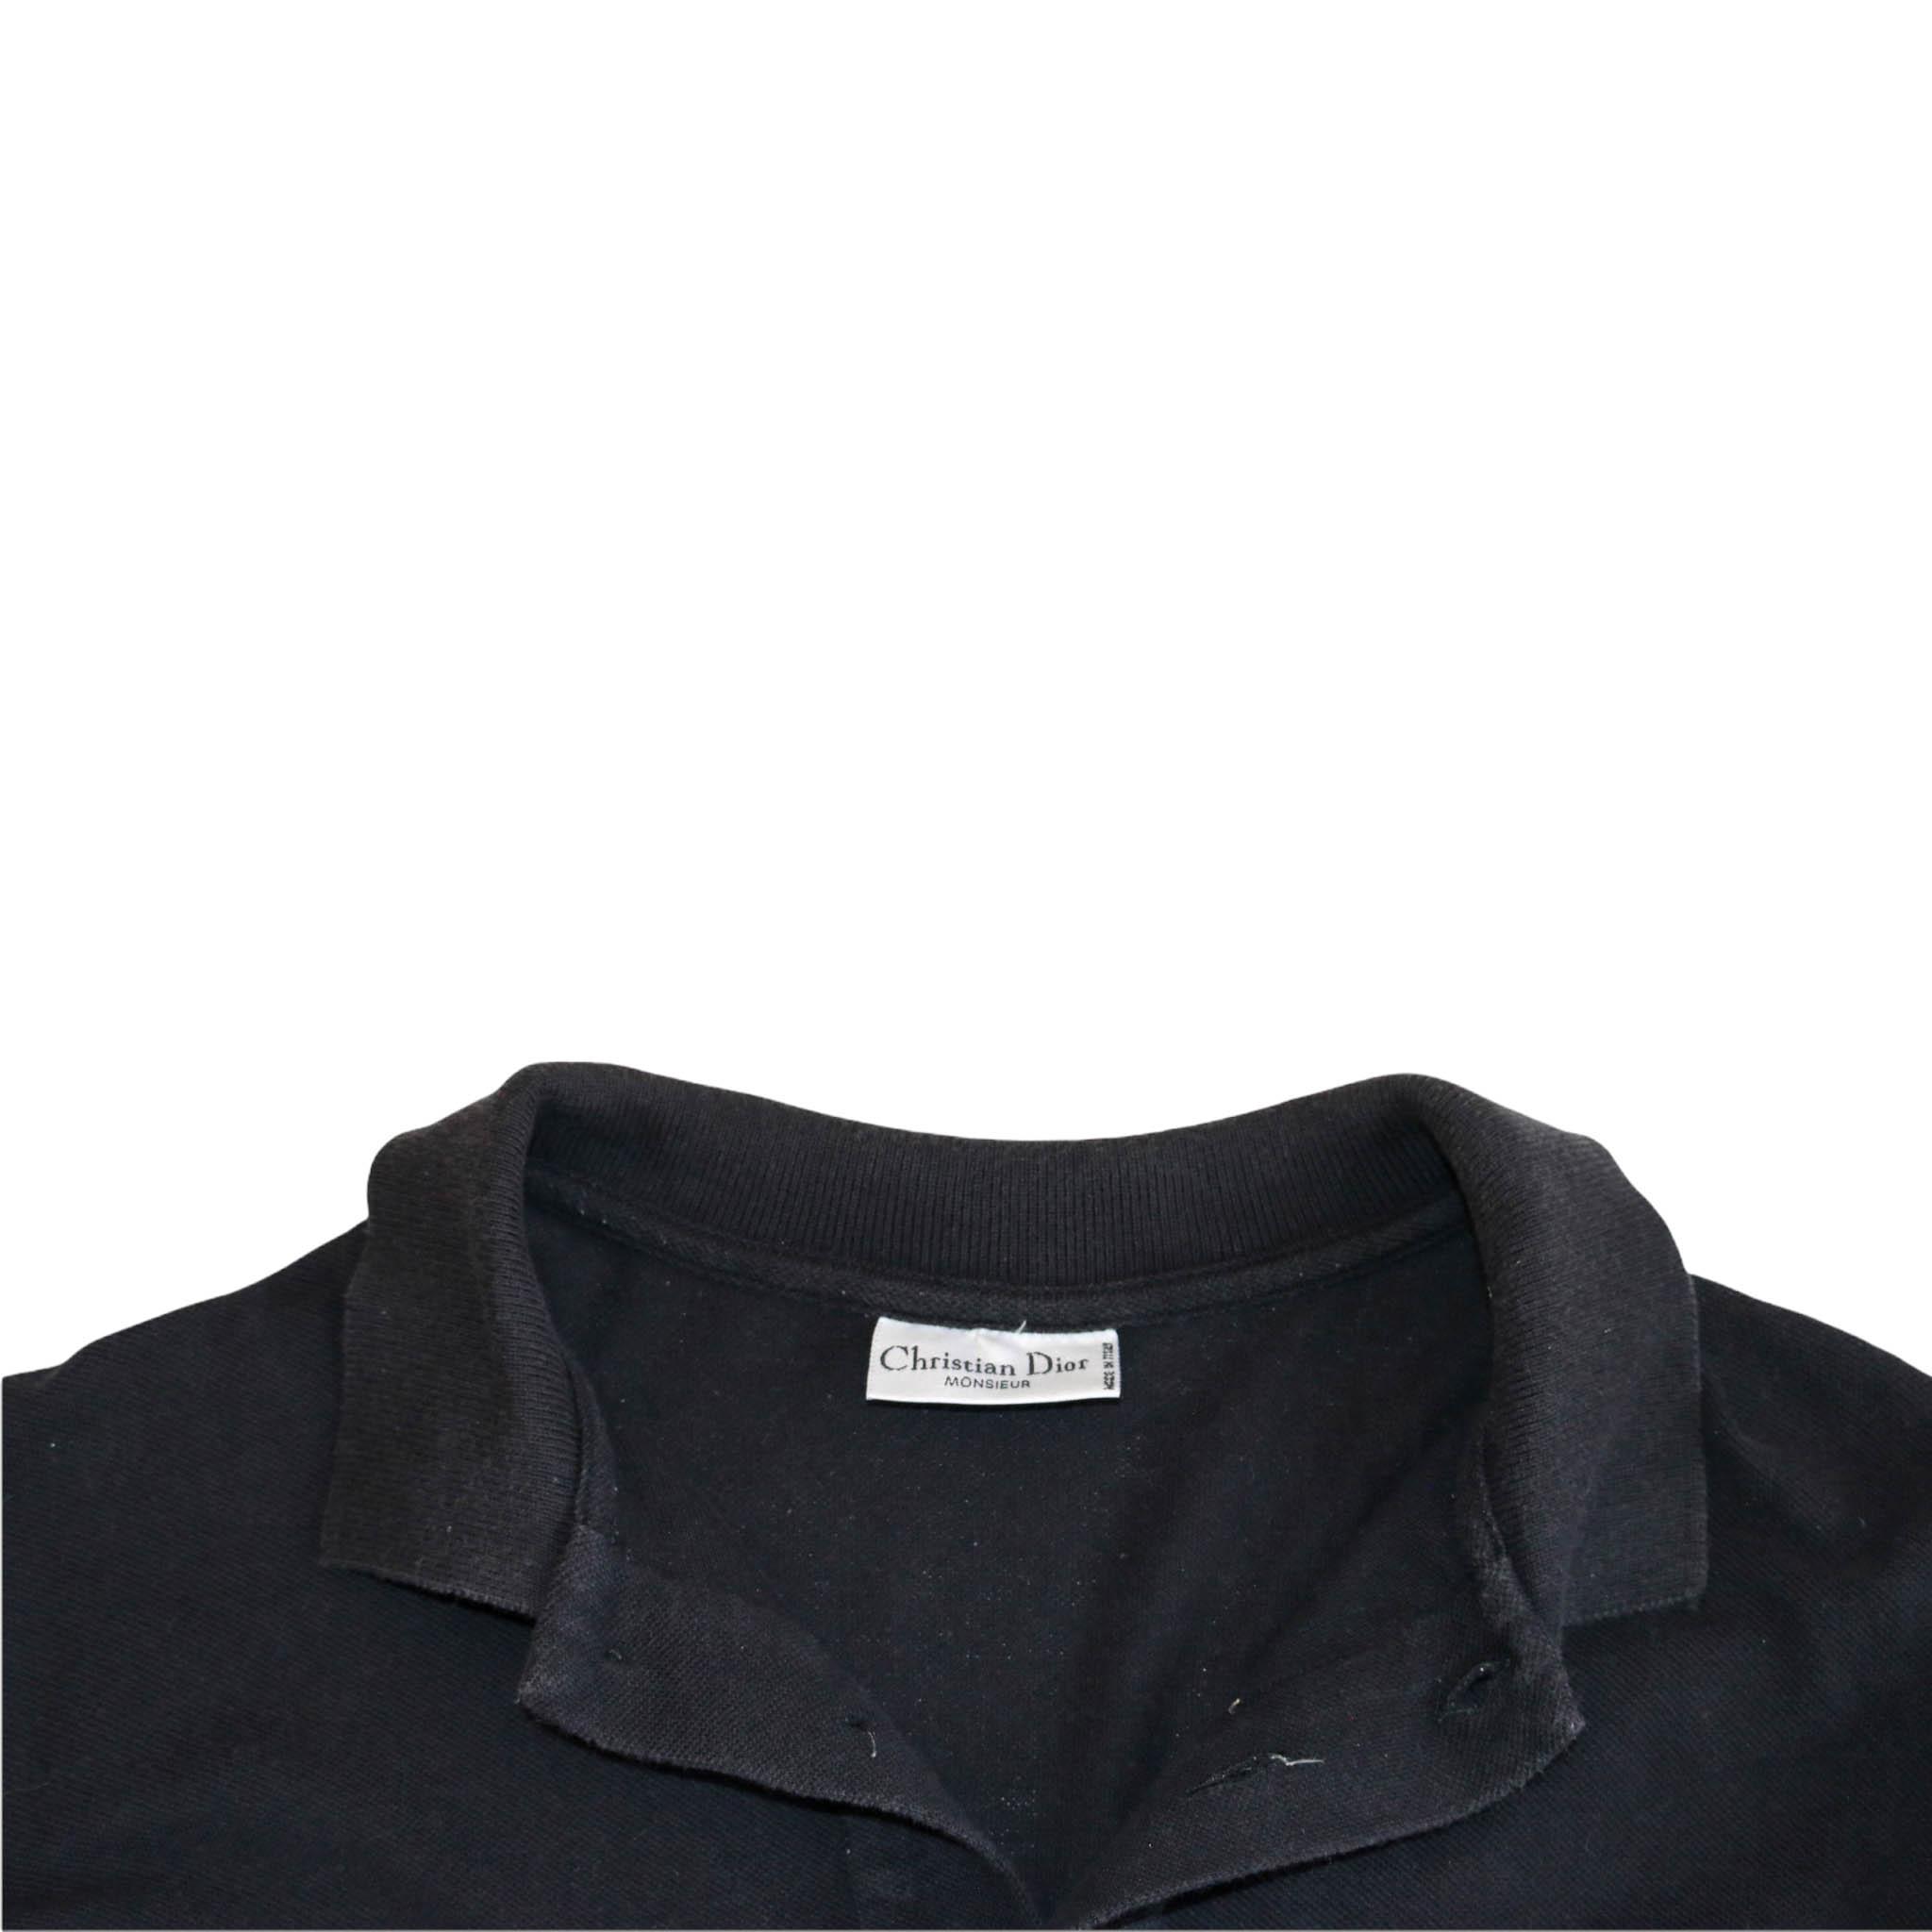 Christian Dior Black Polo